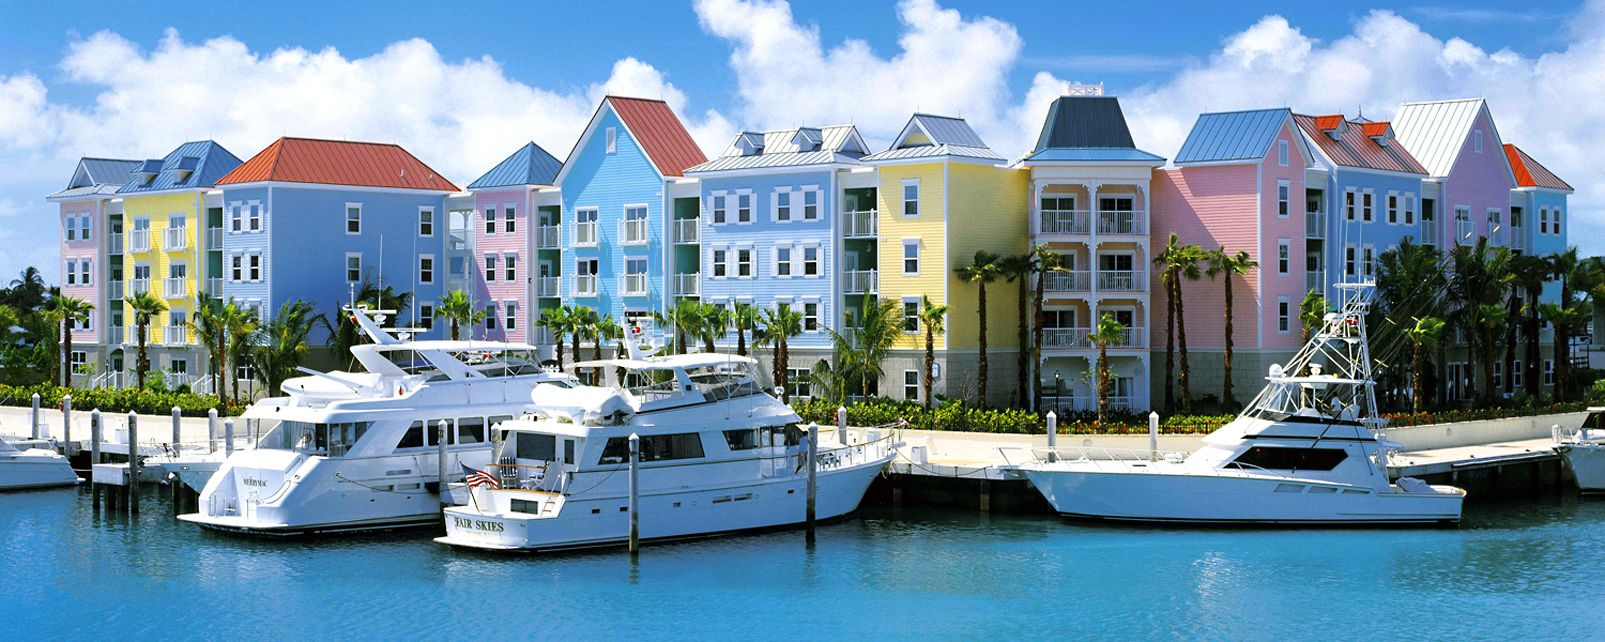 bahamas atlantis hotel